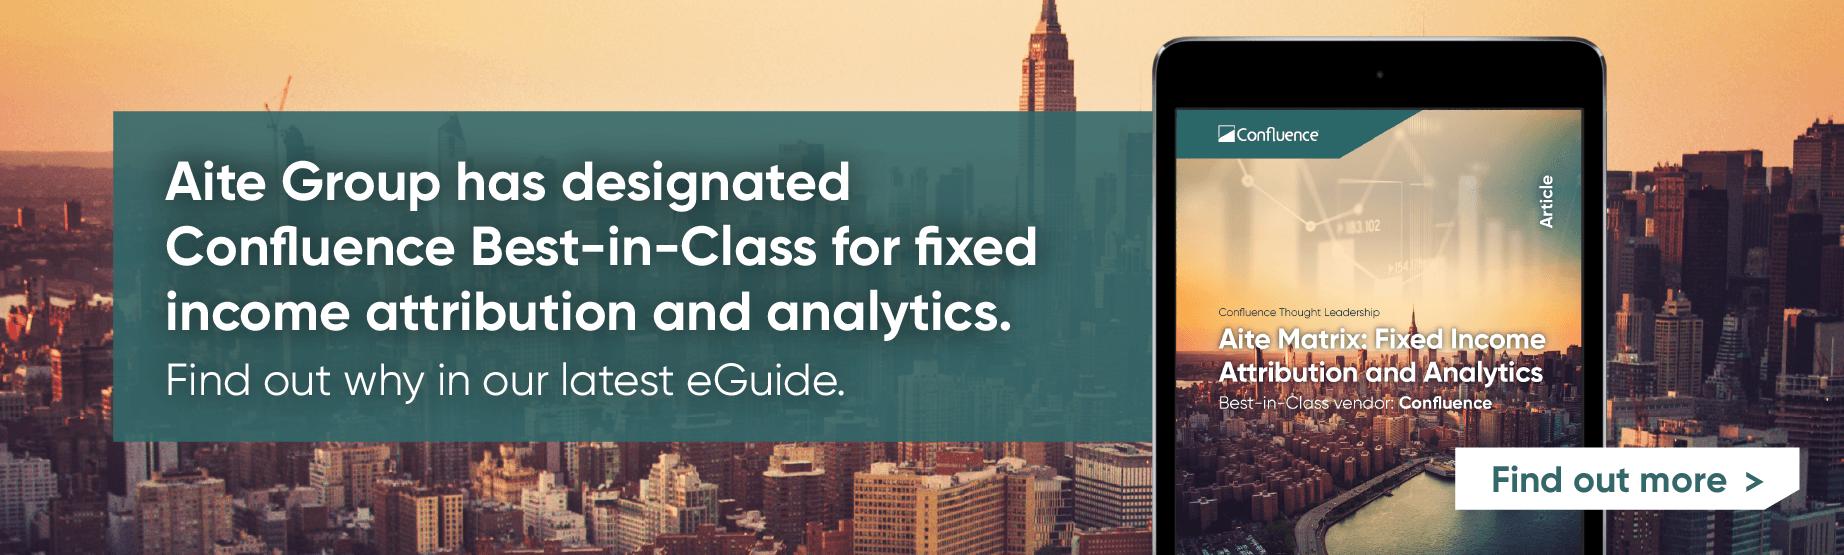 Download Aite Matrix: Fixed Income Attribution & Analytics